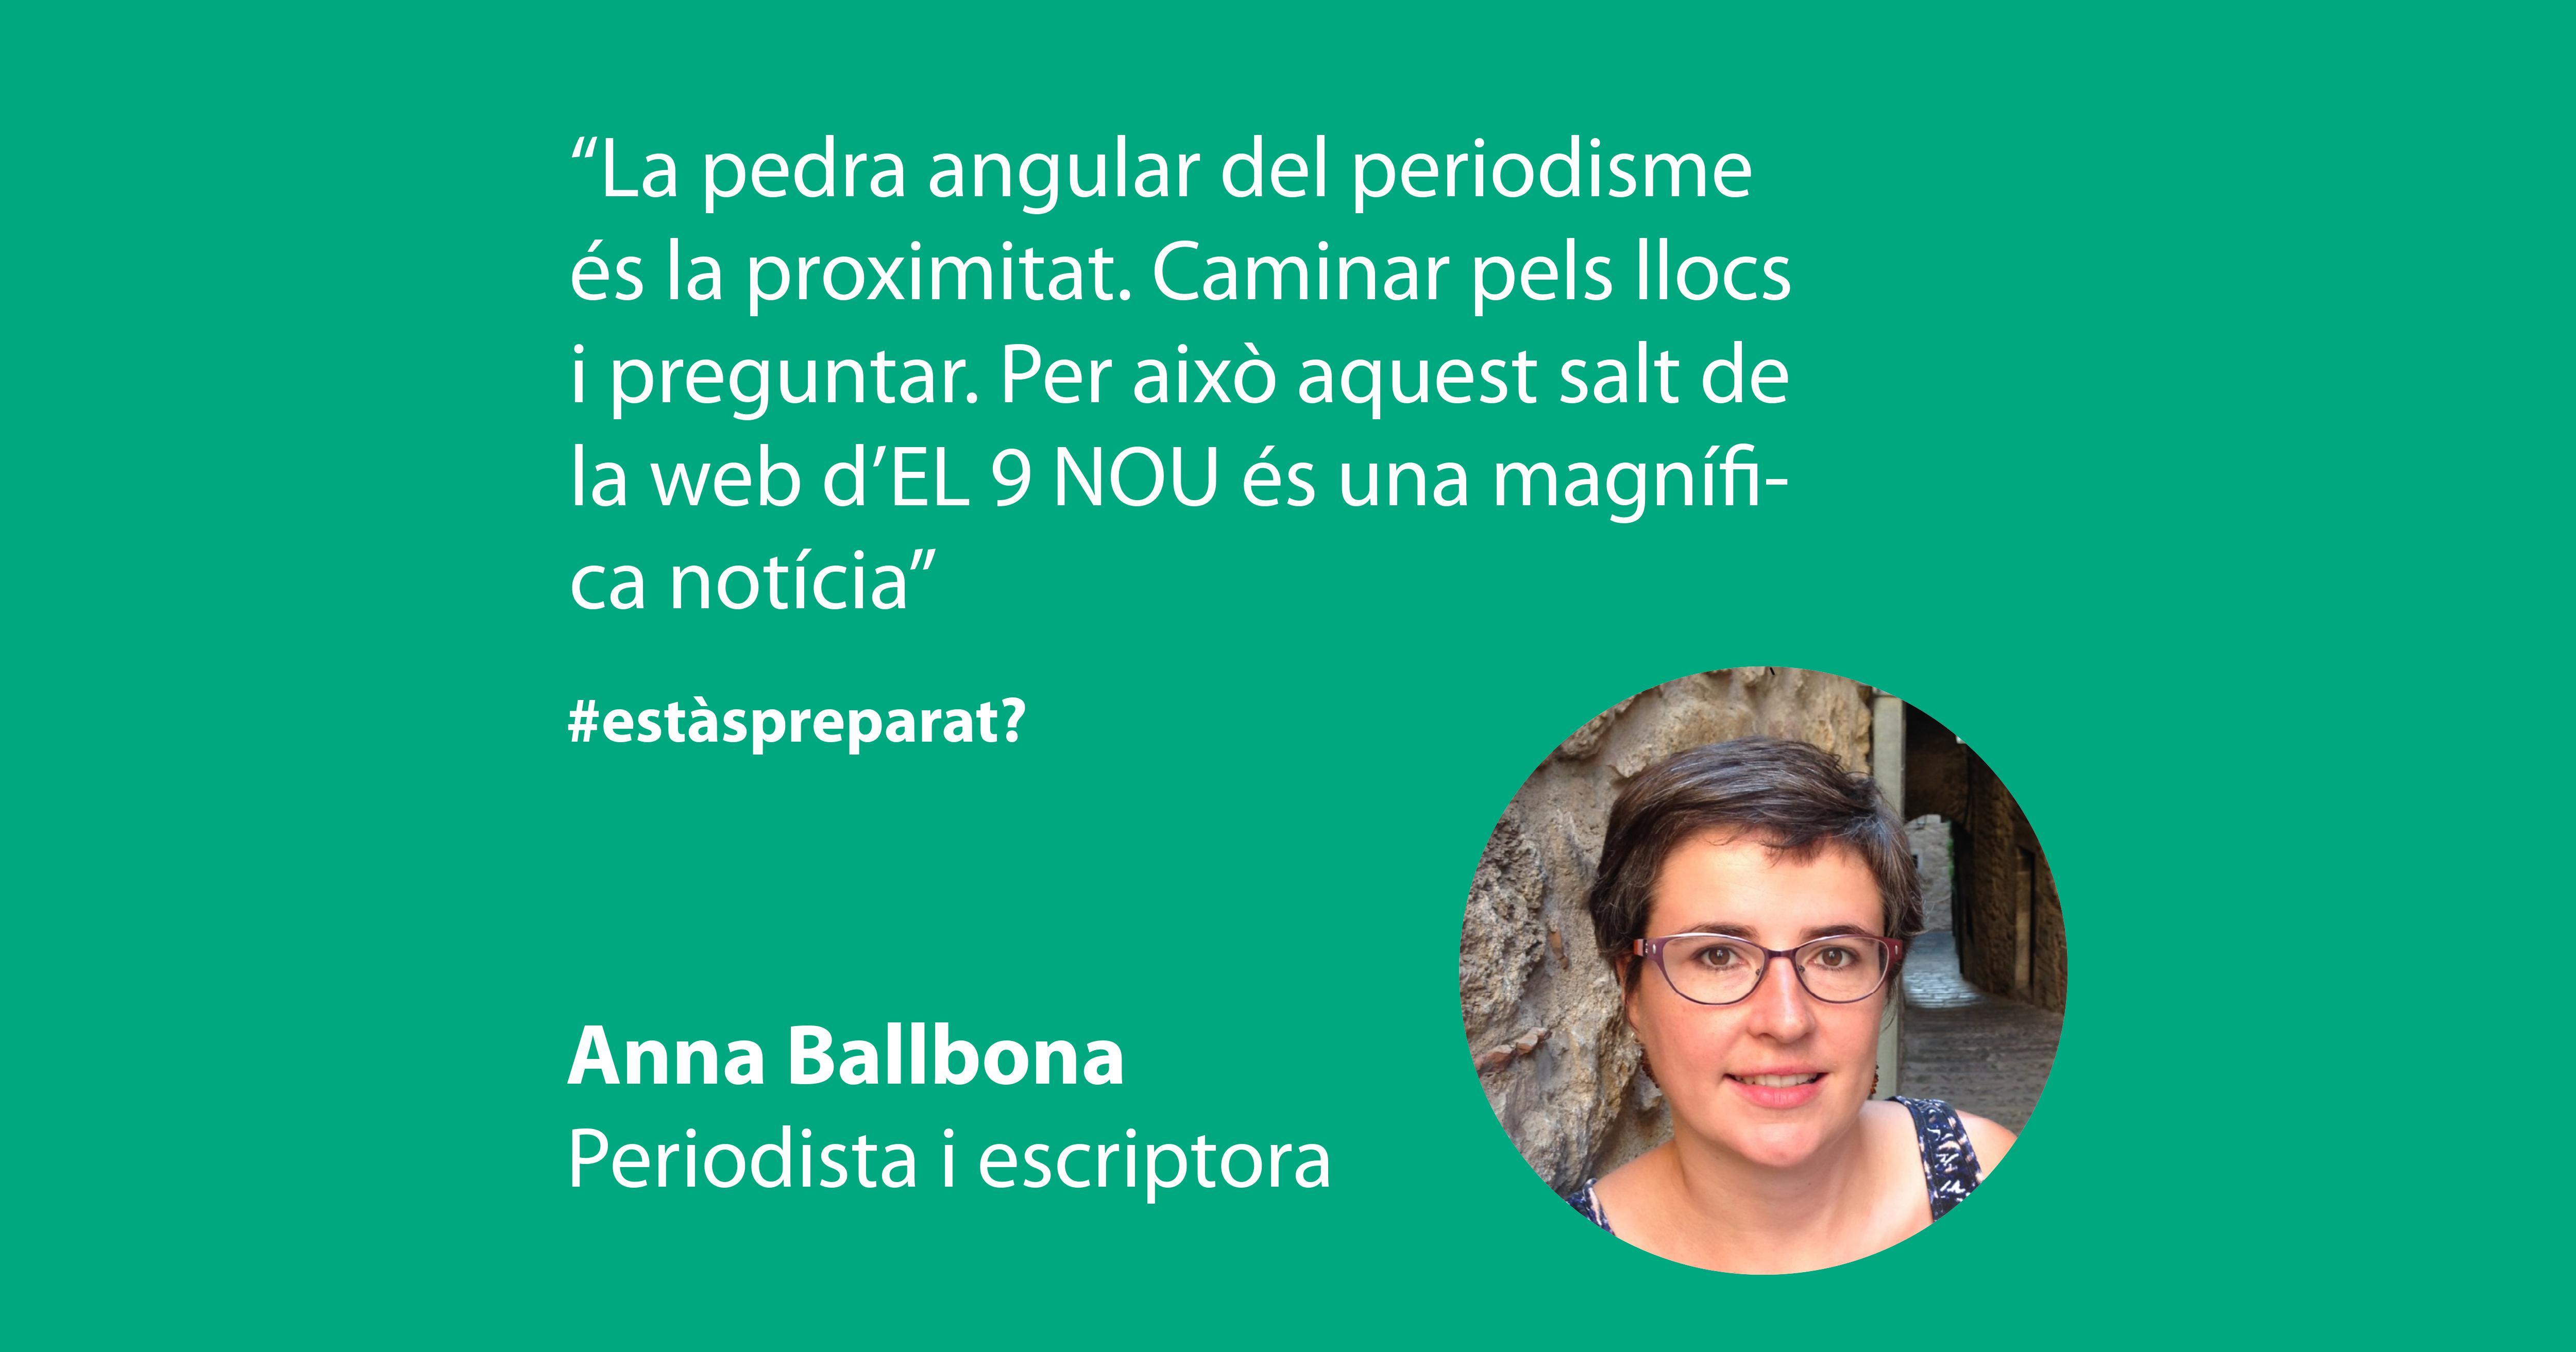 Anna Ballbona